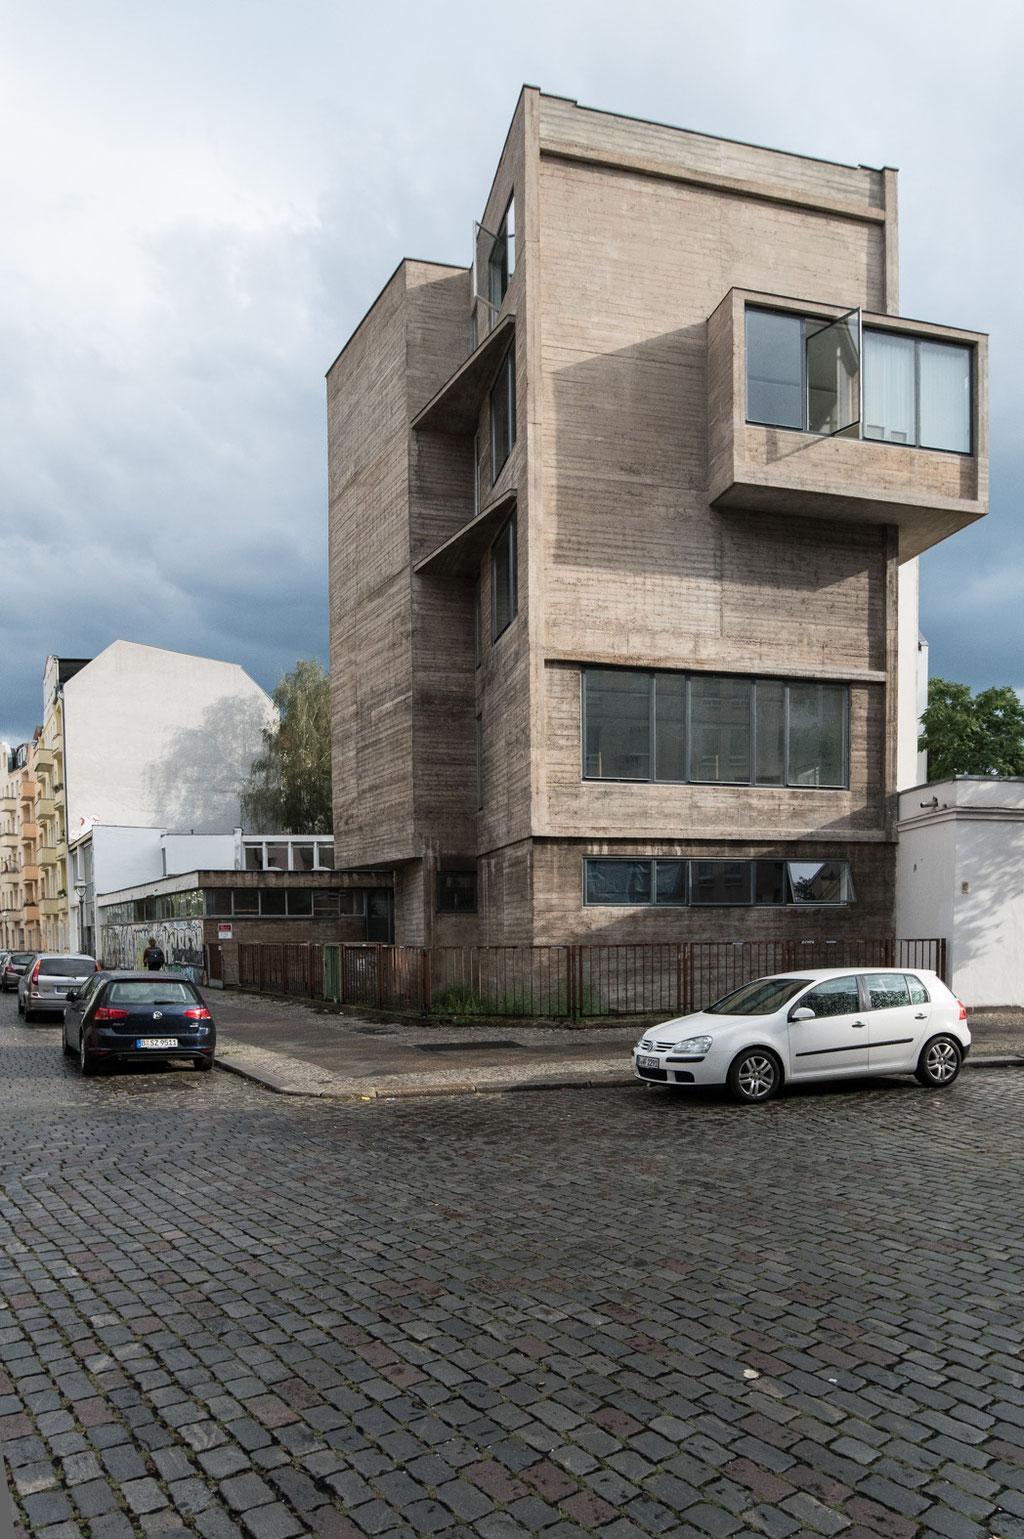 Rotaprint, ehem. Druckmaschinen-Werk / former printing press production site (Klaus Kirsten, Heinz Nather), Berlin-Wedding (D)